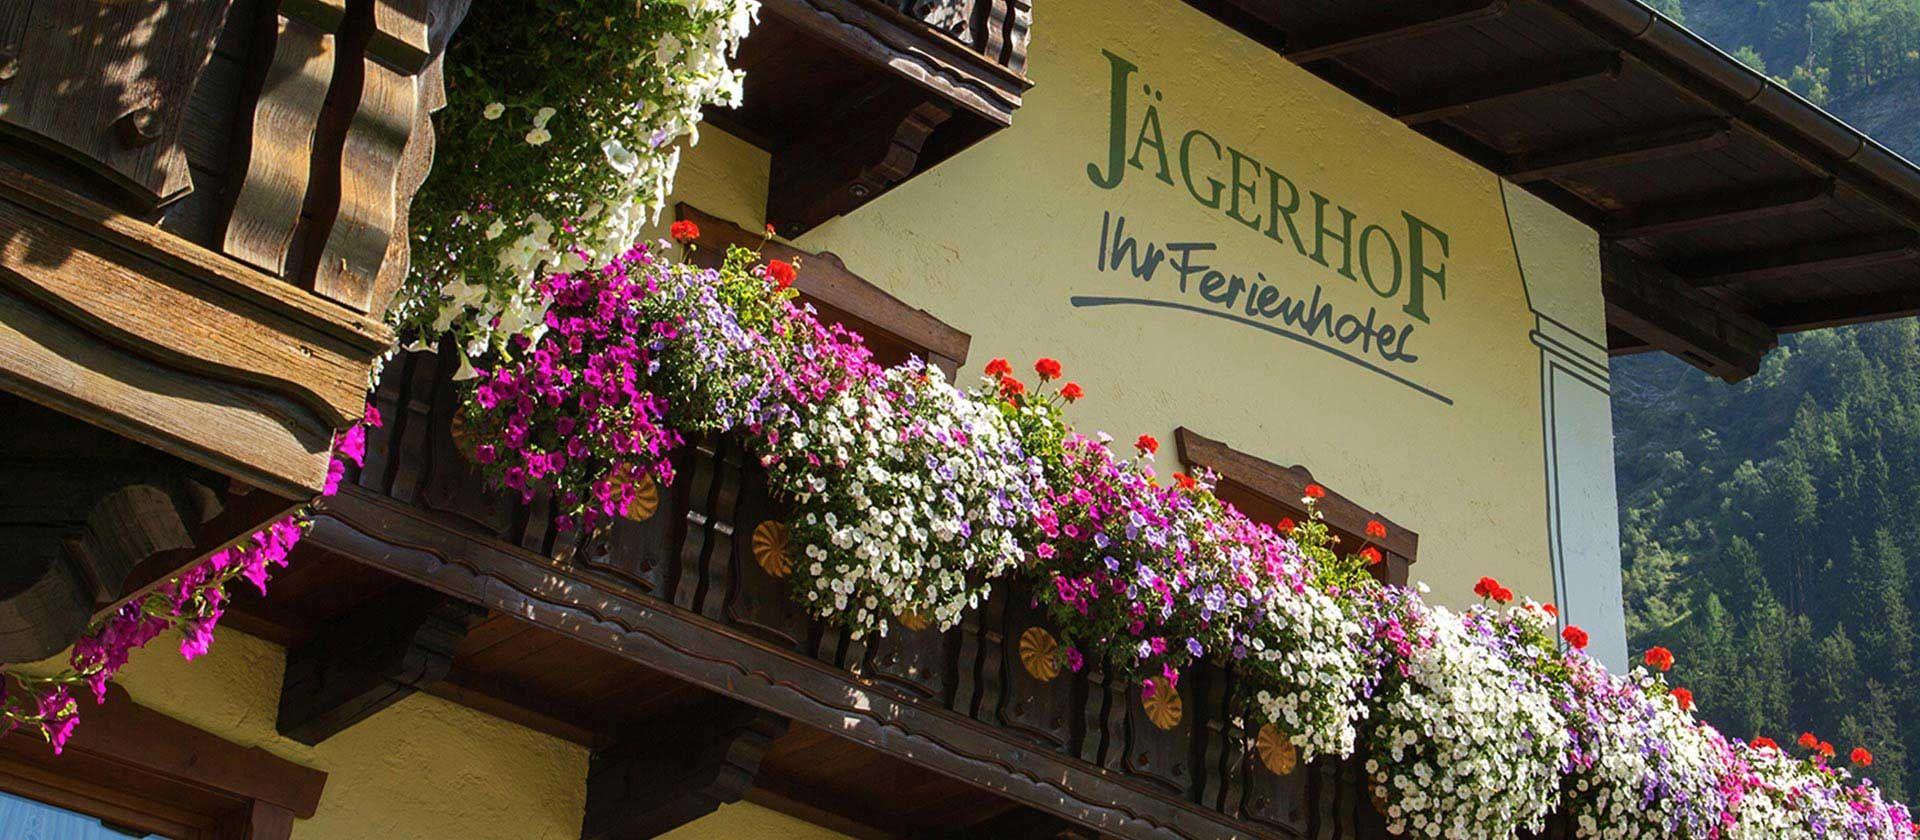 Hotel Jägerhof im Sommer - Foto: Hotel Jägerhof